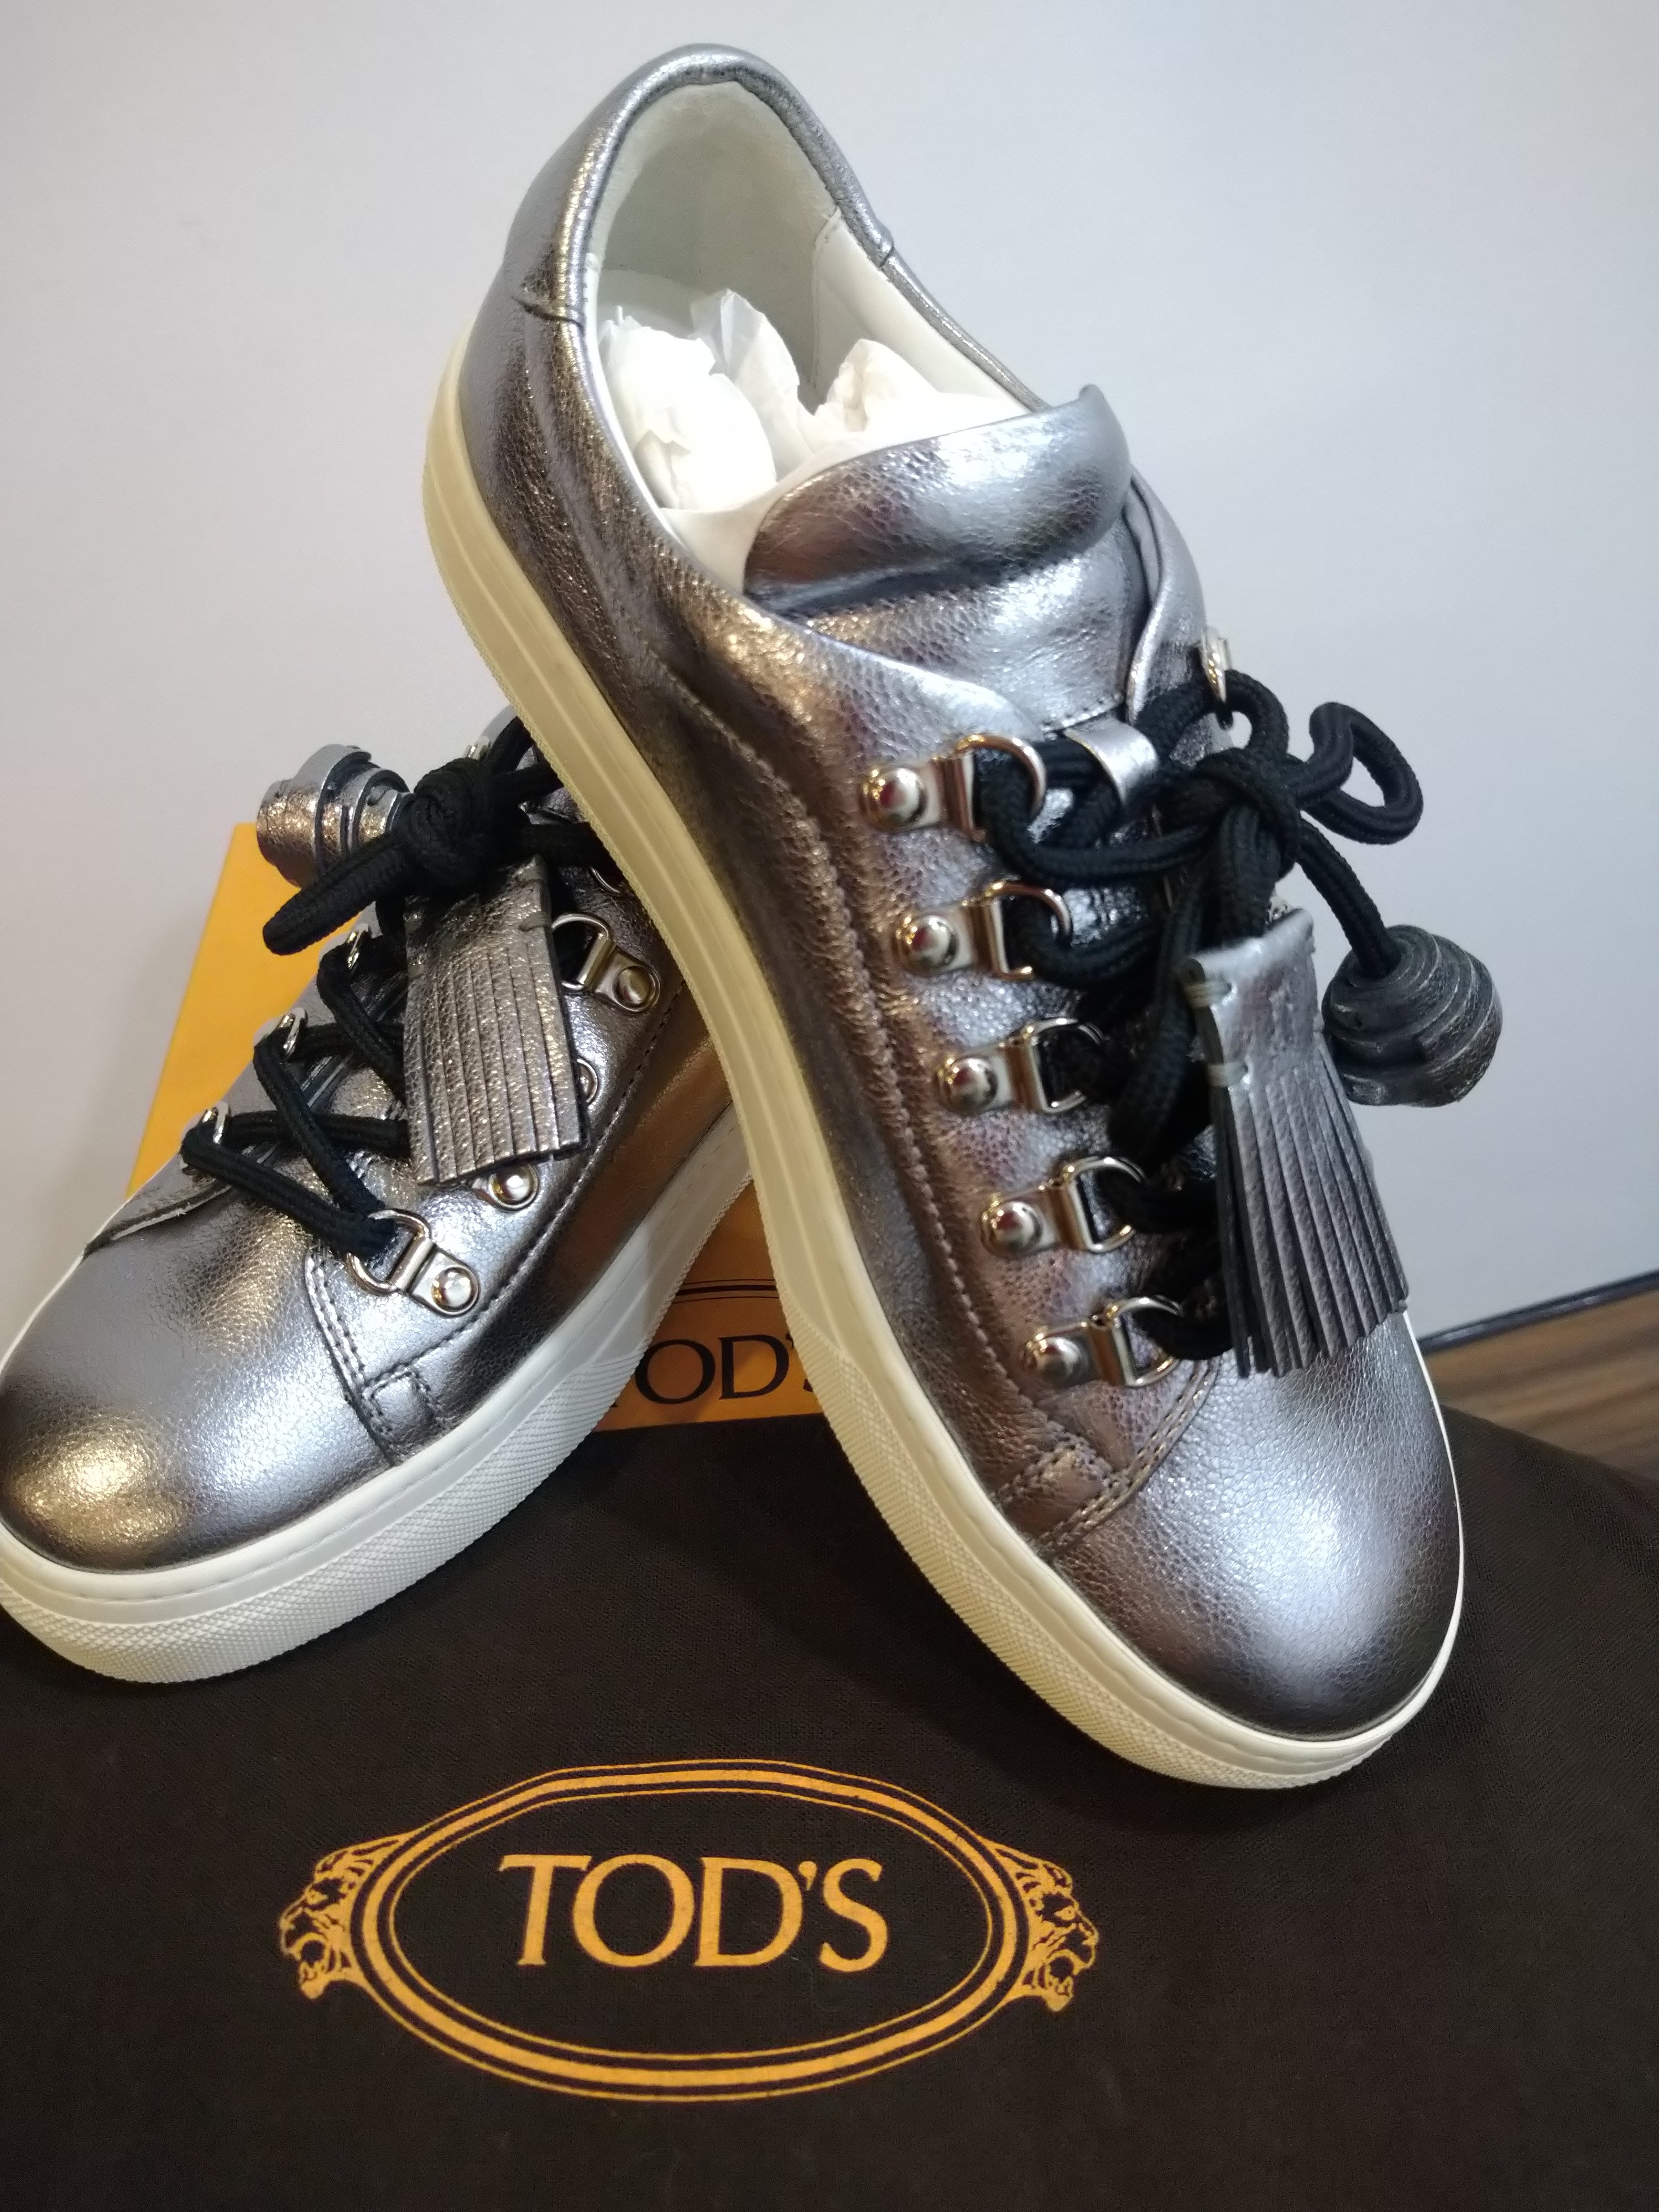 TODS銀色牛皮鞋帶膠底休閒鞋/平底鞋/潮鞋(37號 )~~全新品出清